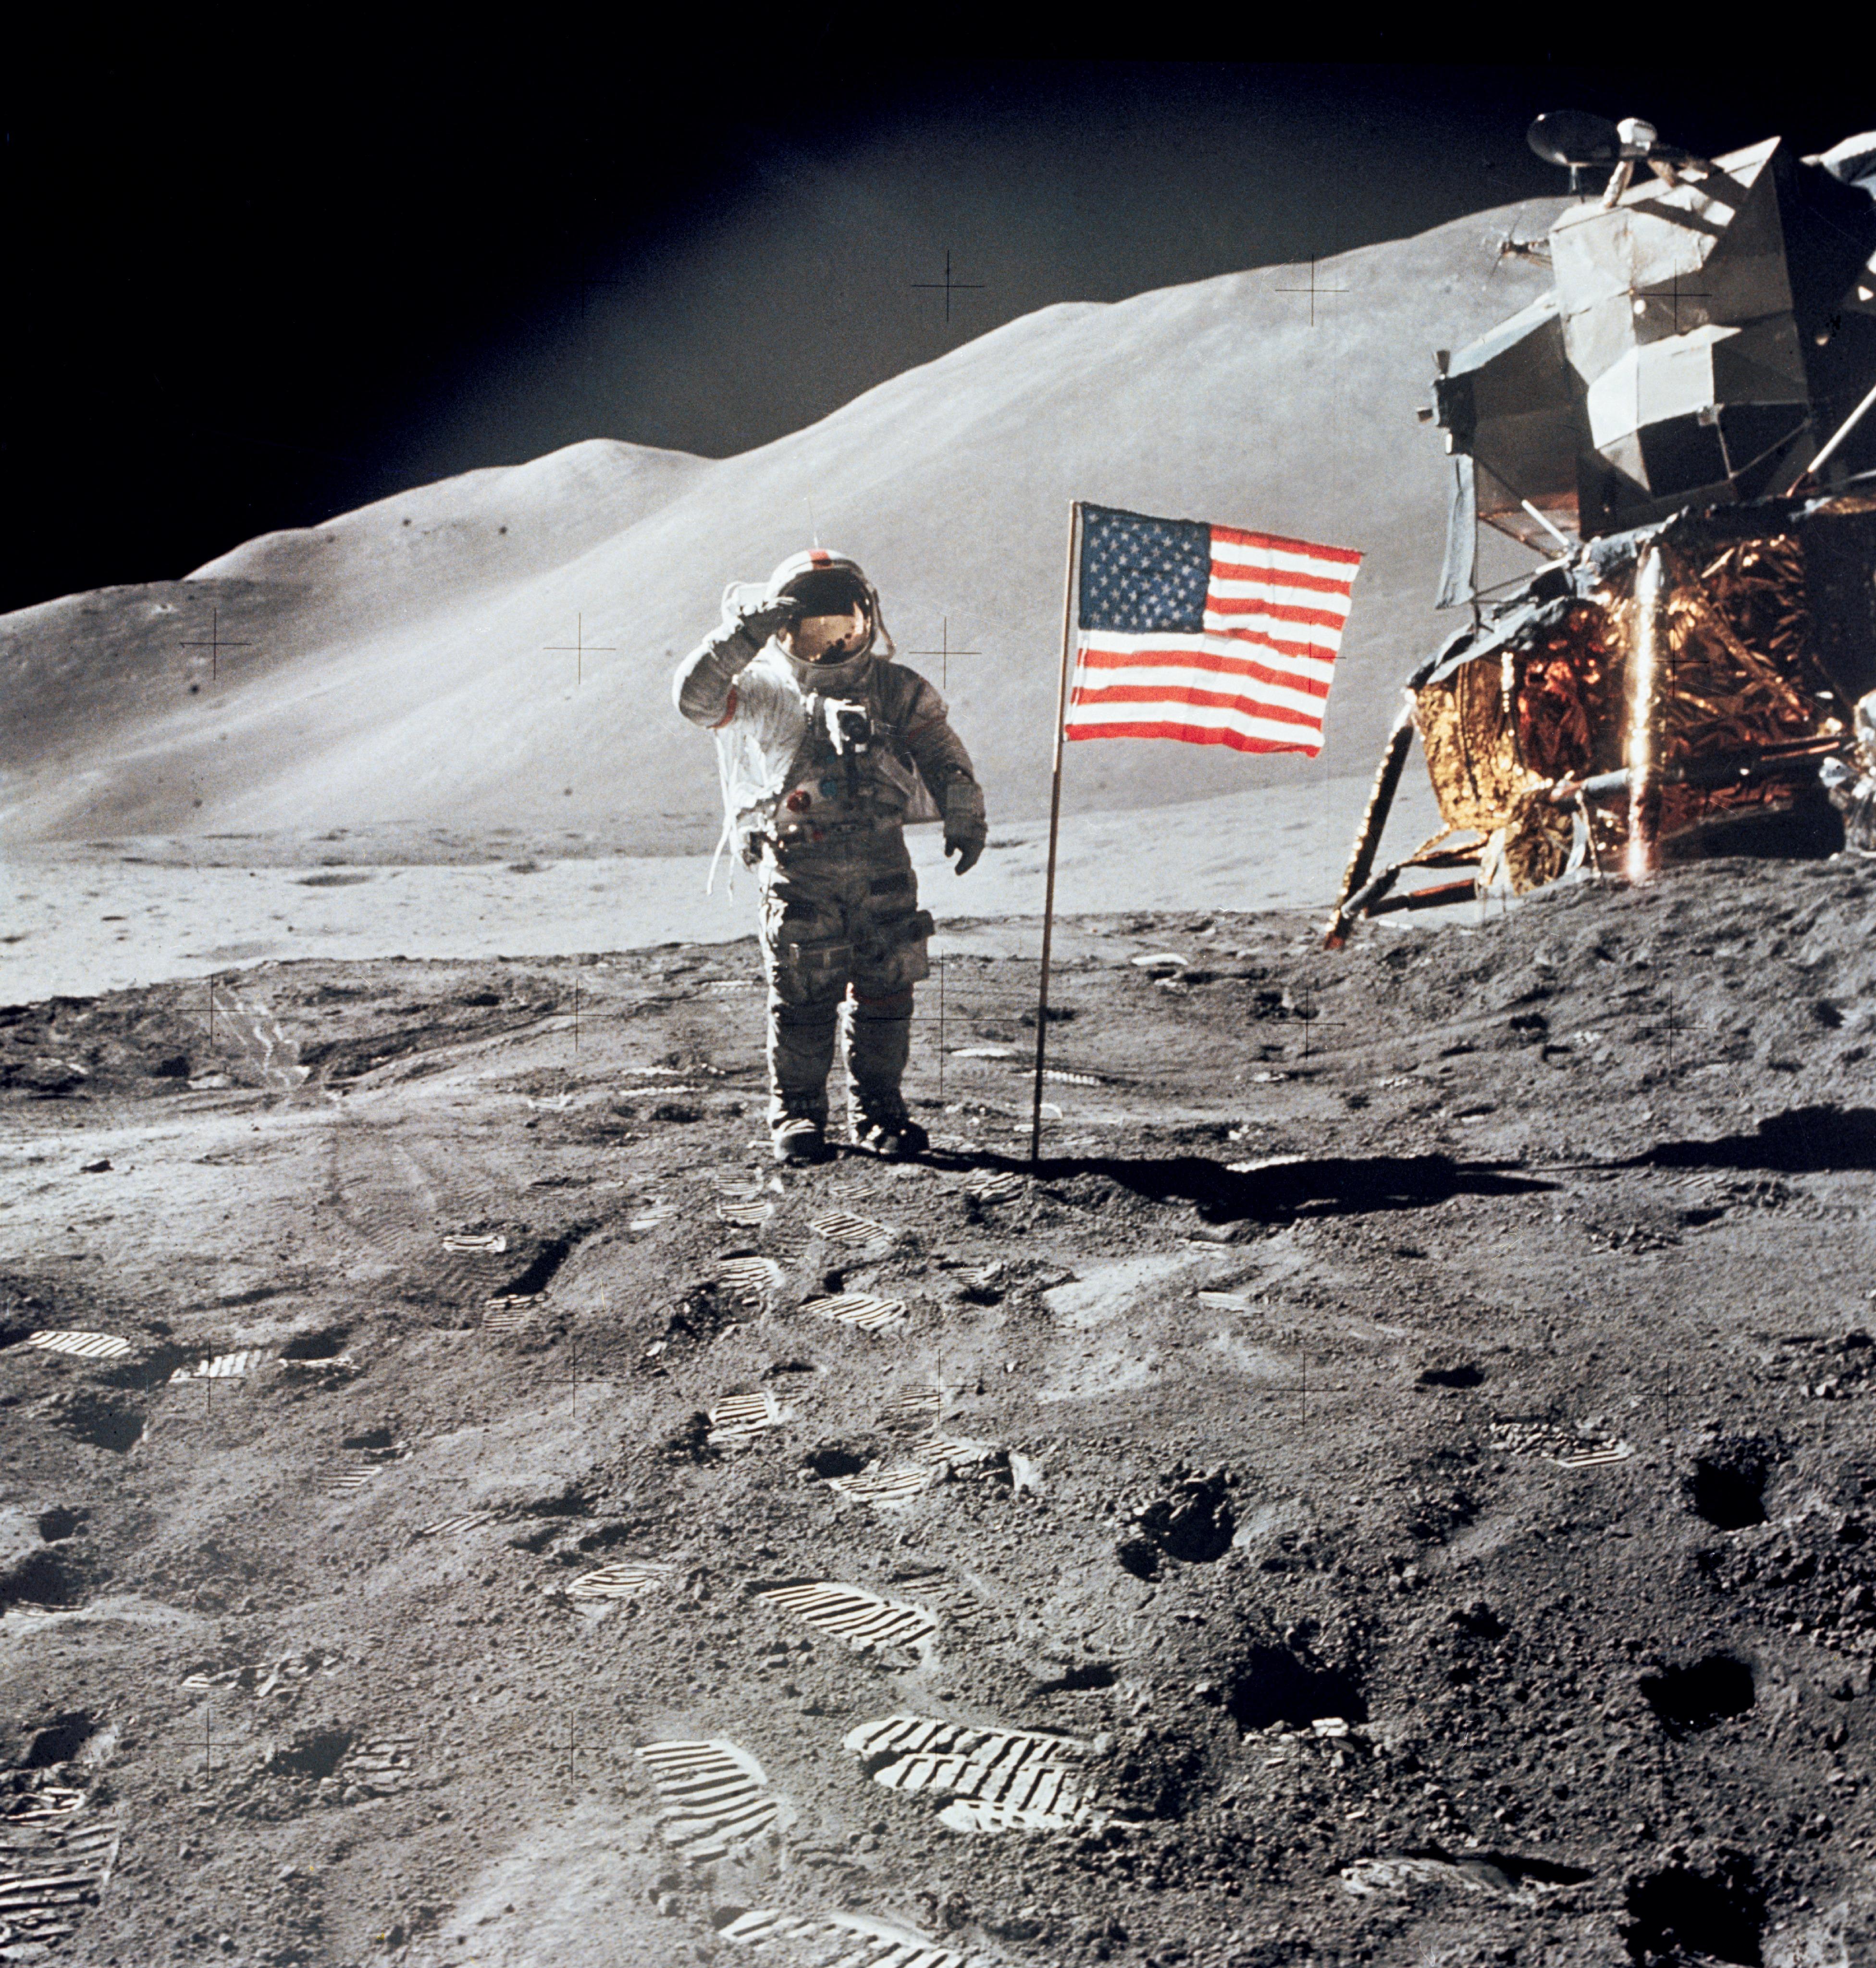 Astronaut David Scott Gives Salute Beside U.S. Flag During ...